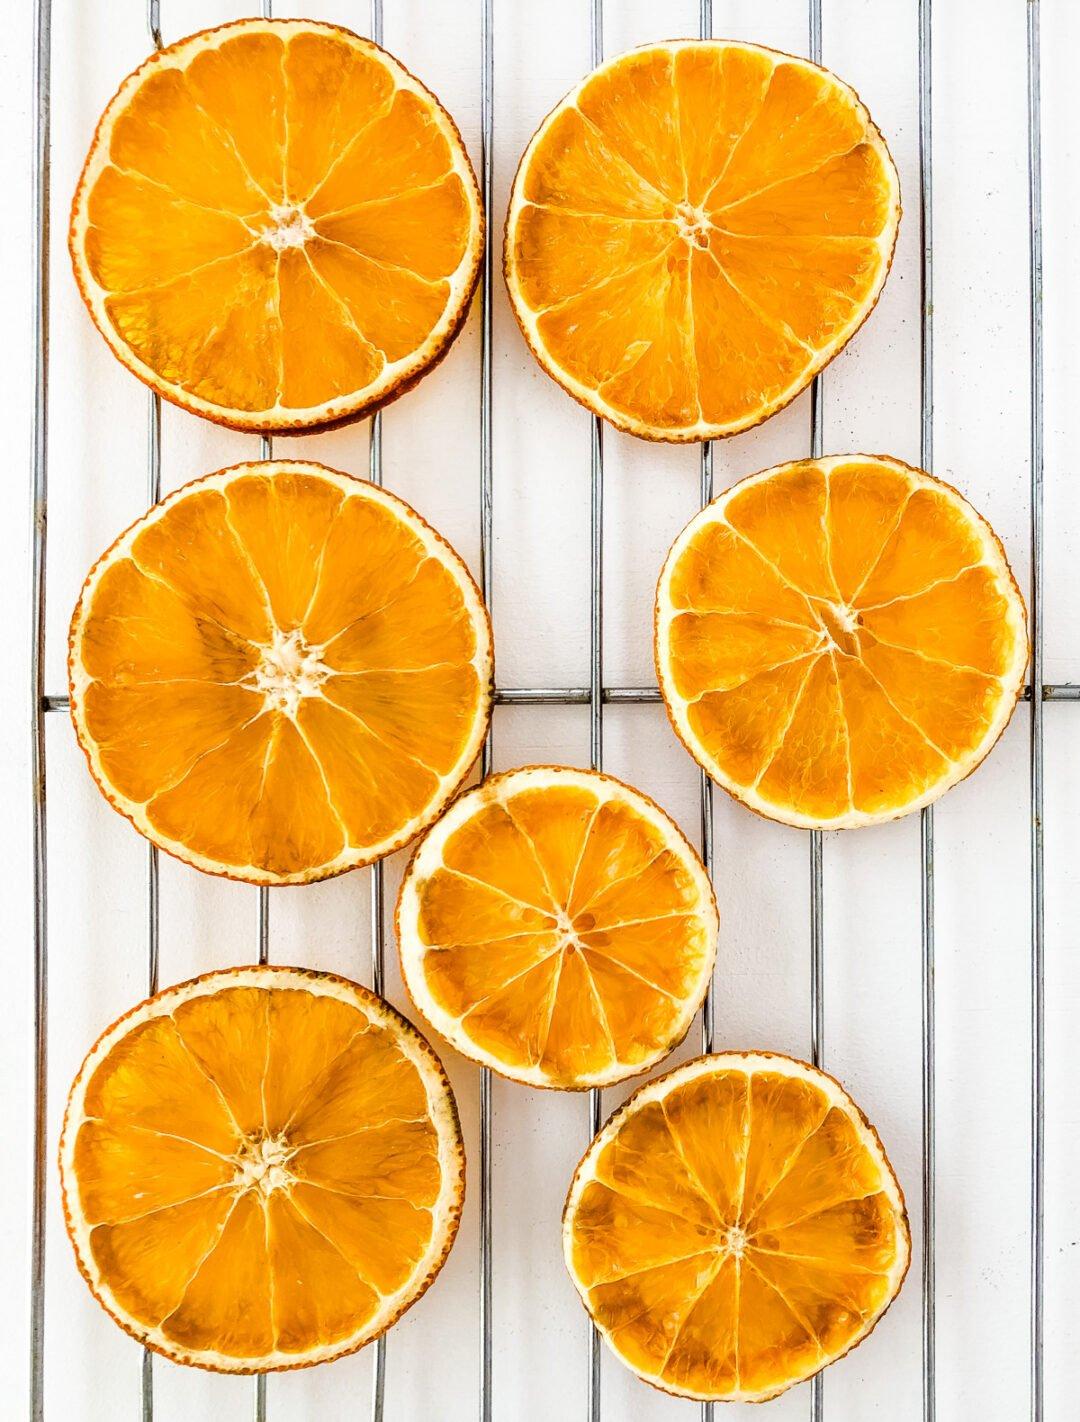 Naturally Dried Dried orange slice Dried fruit